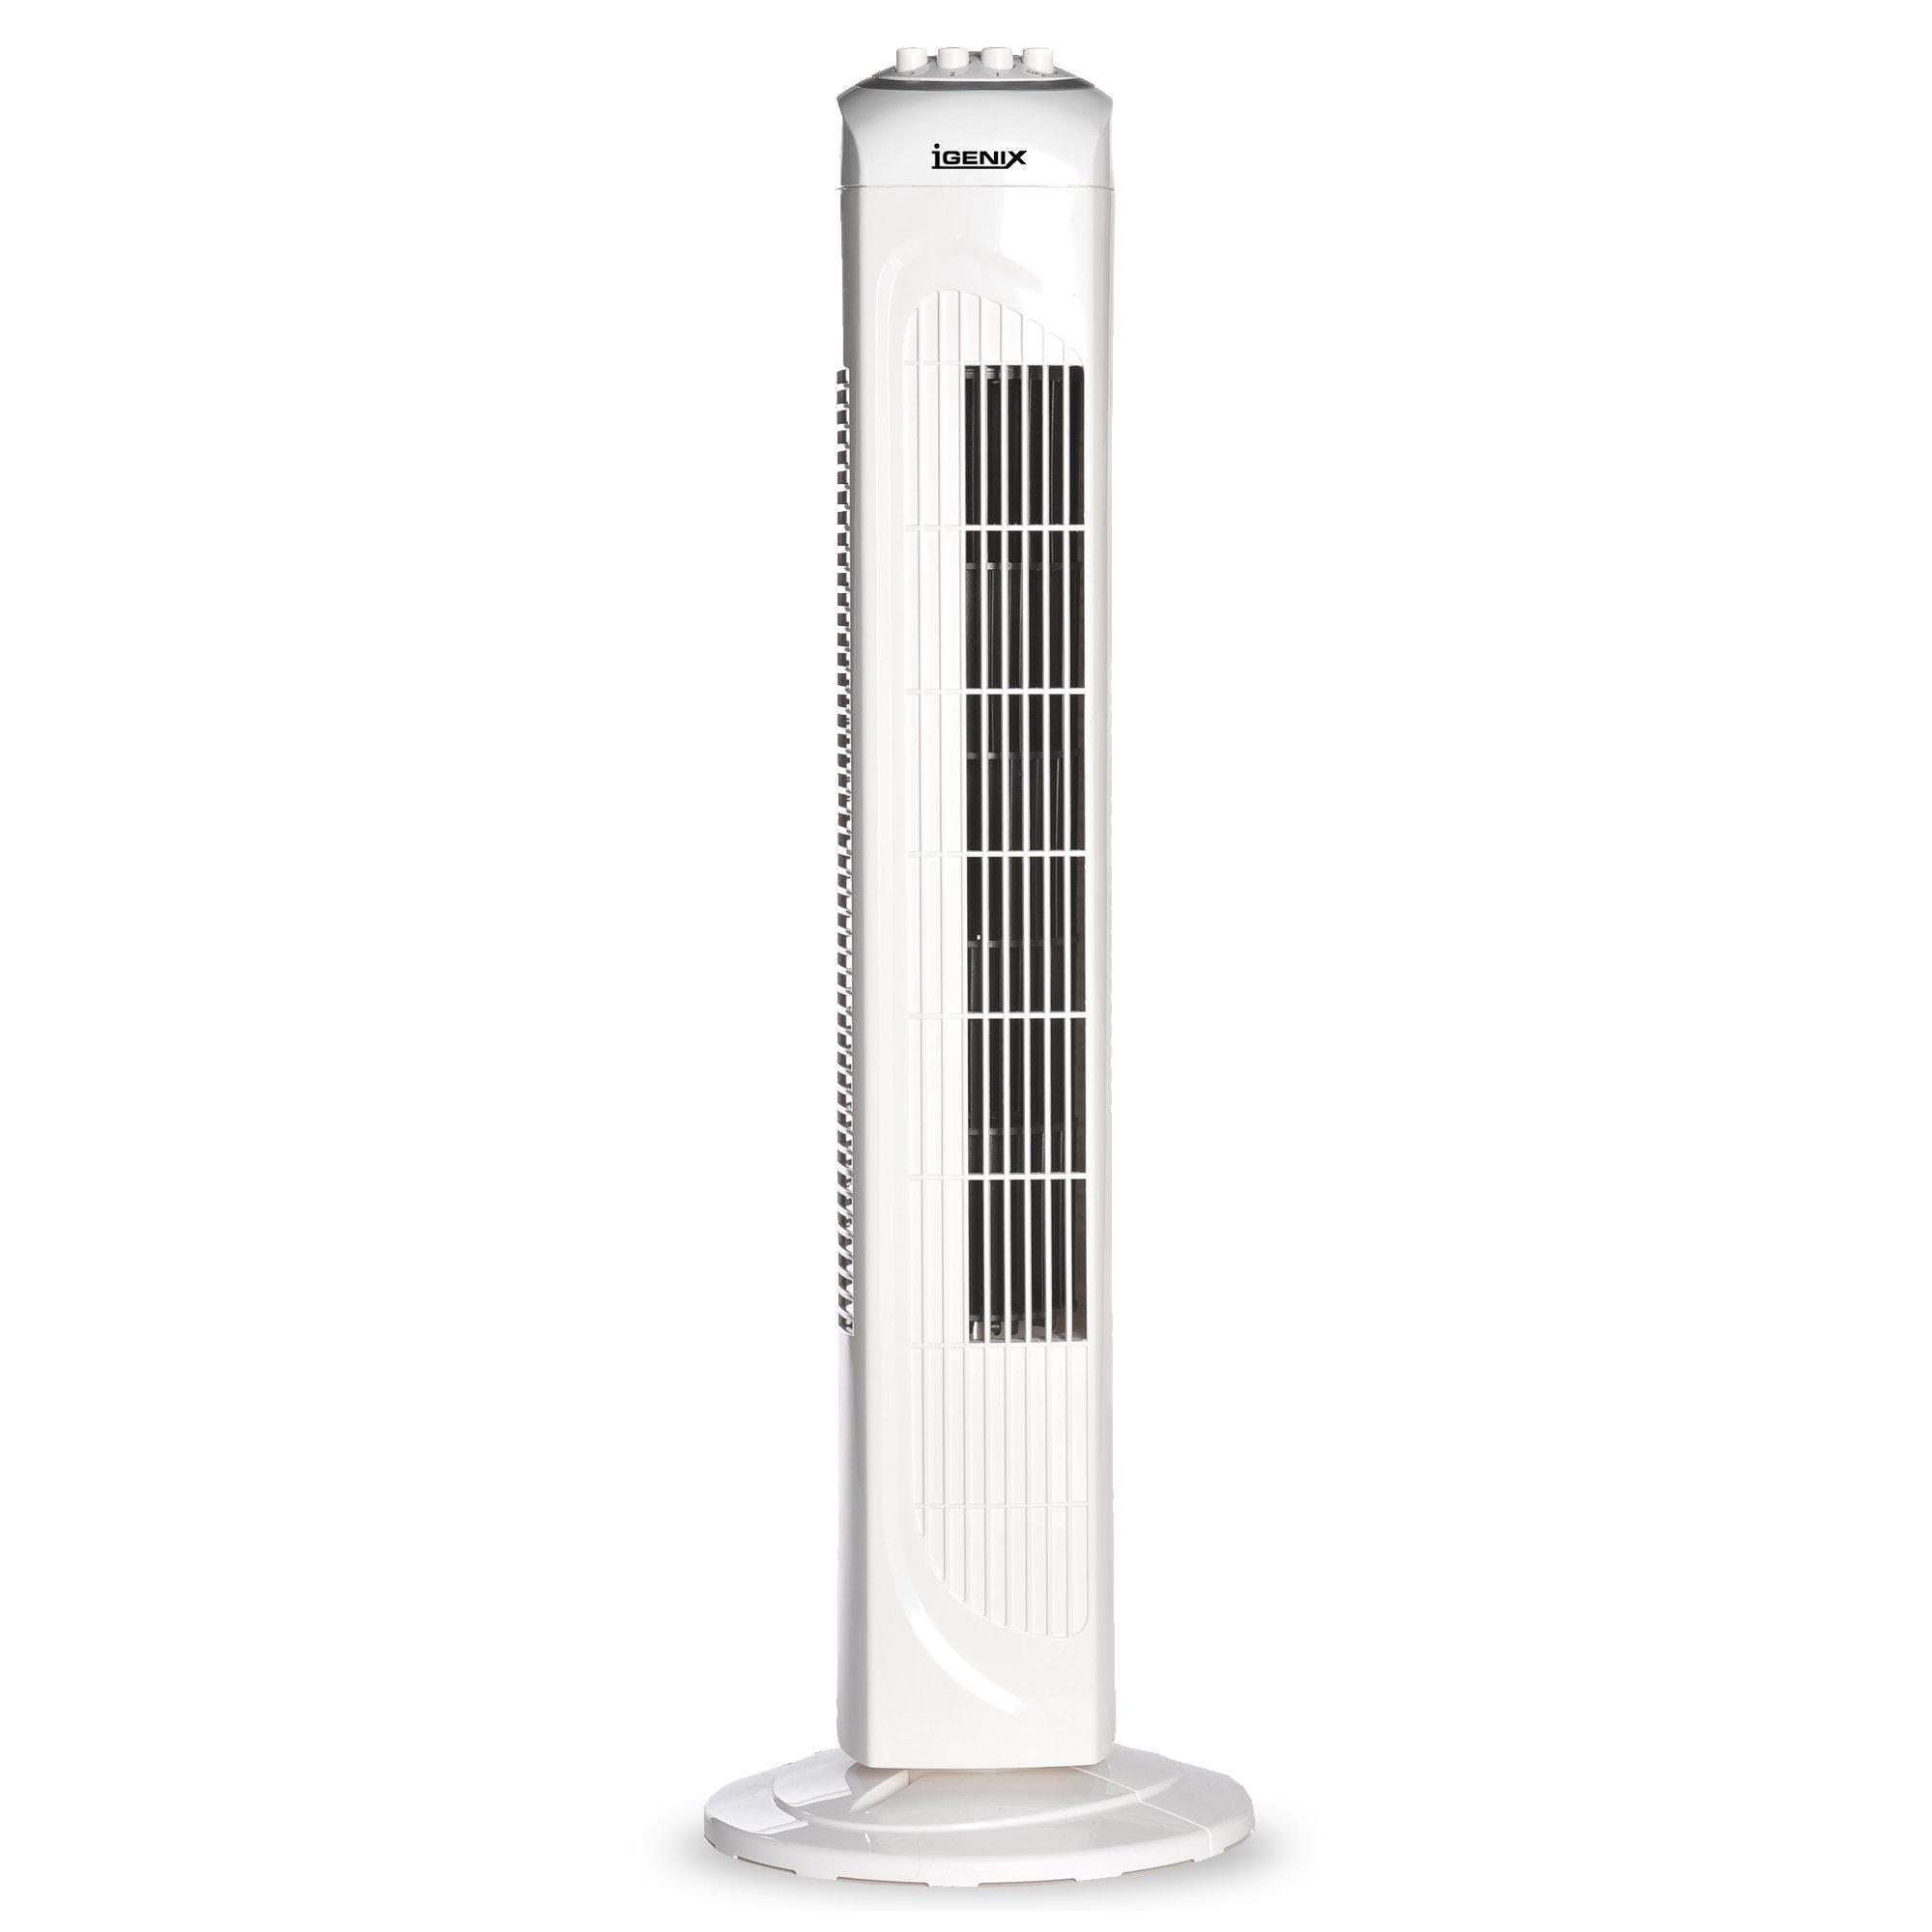 igenix df0030 oscillating tower fan with timer 30 inch. Black Bedroom Furniture Sets. Home Design Ideas